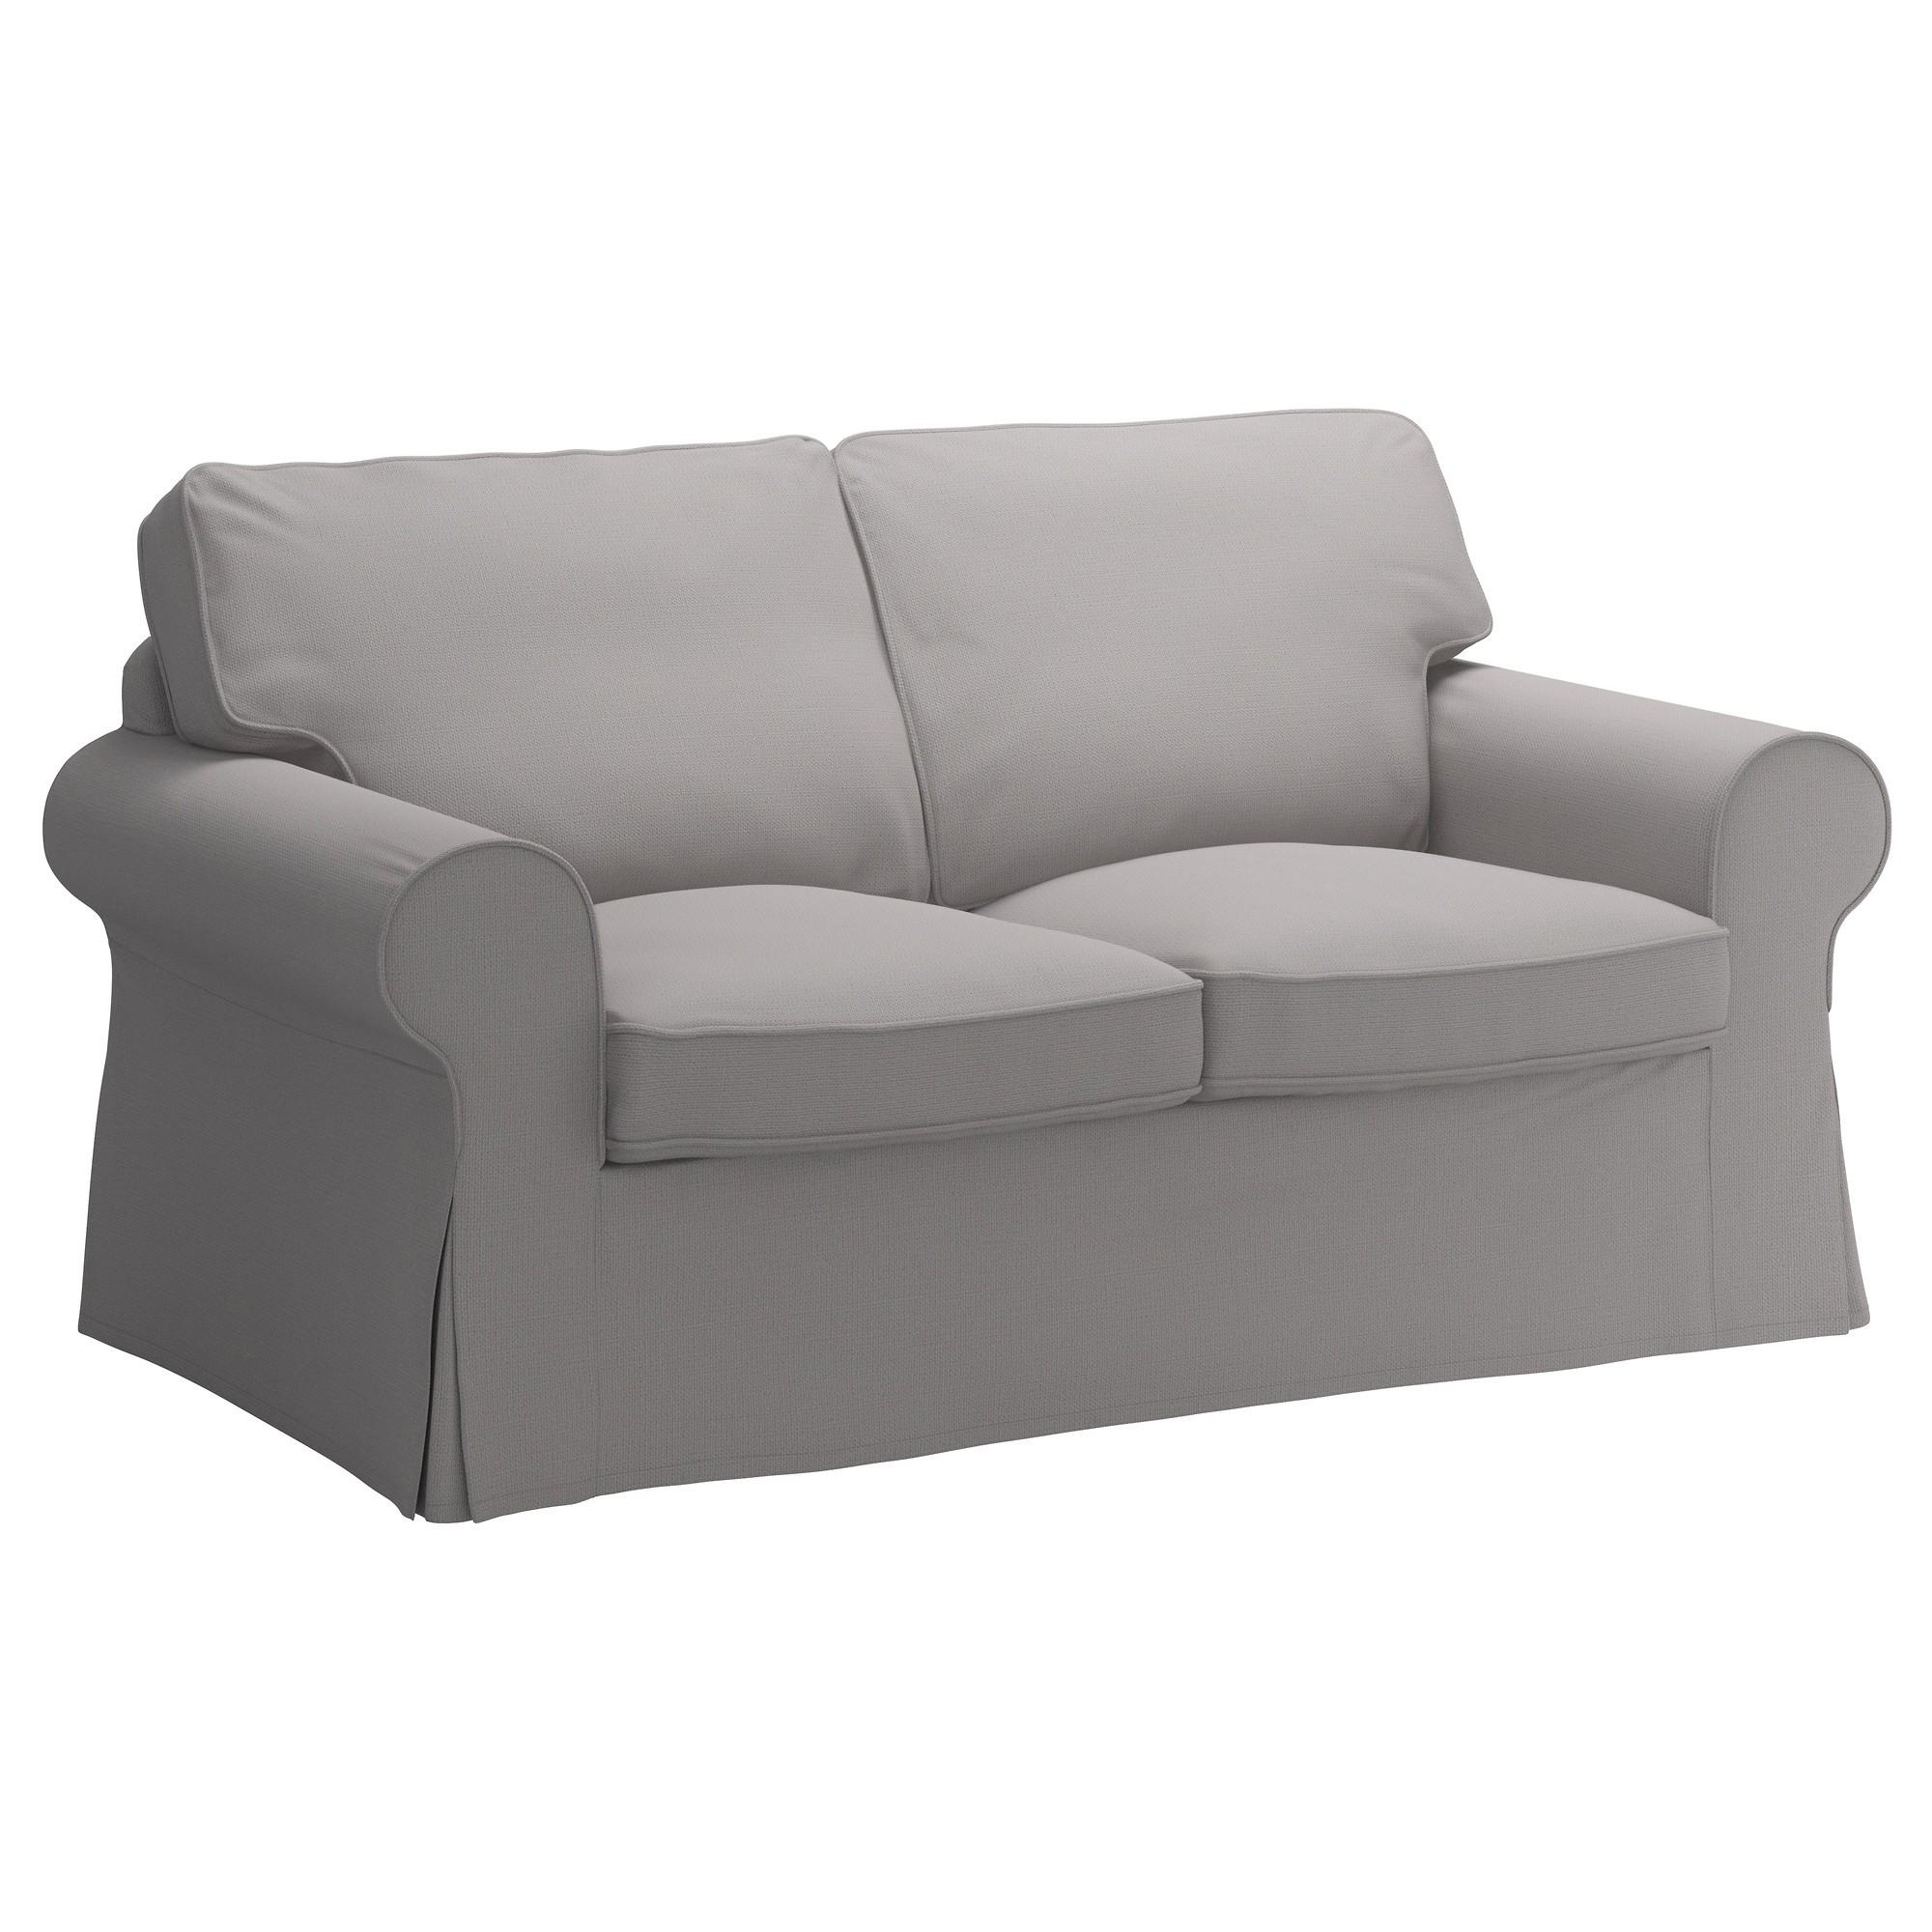 Ikea Canapes Convertibles Ektorp